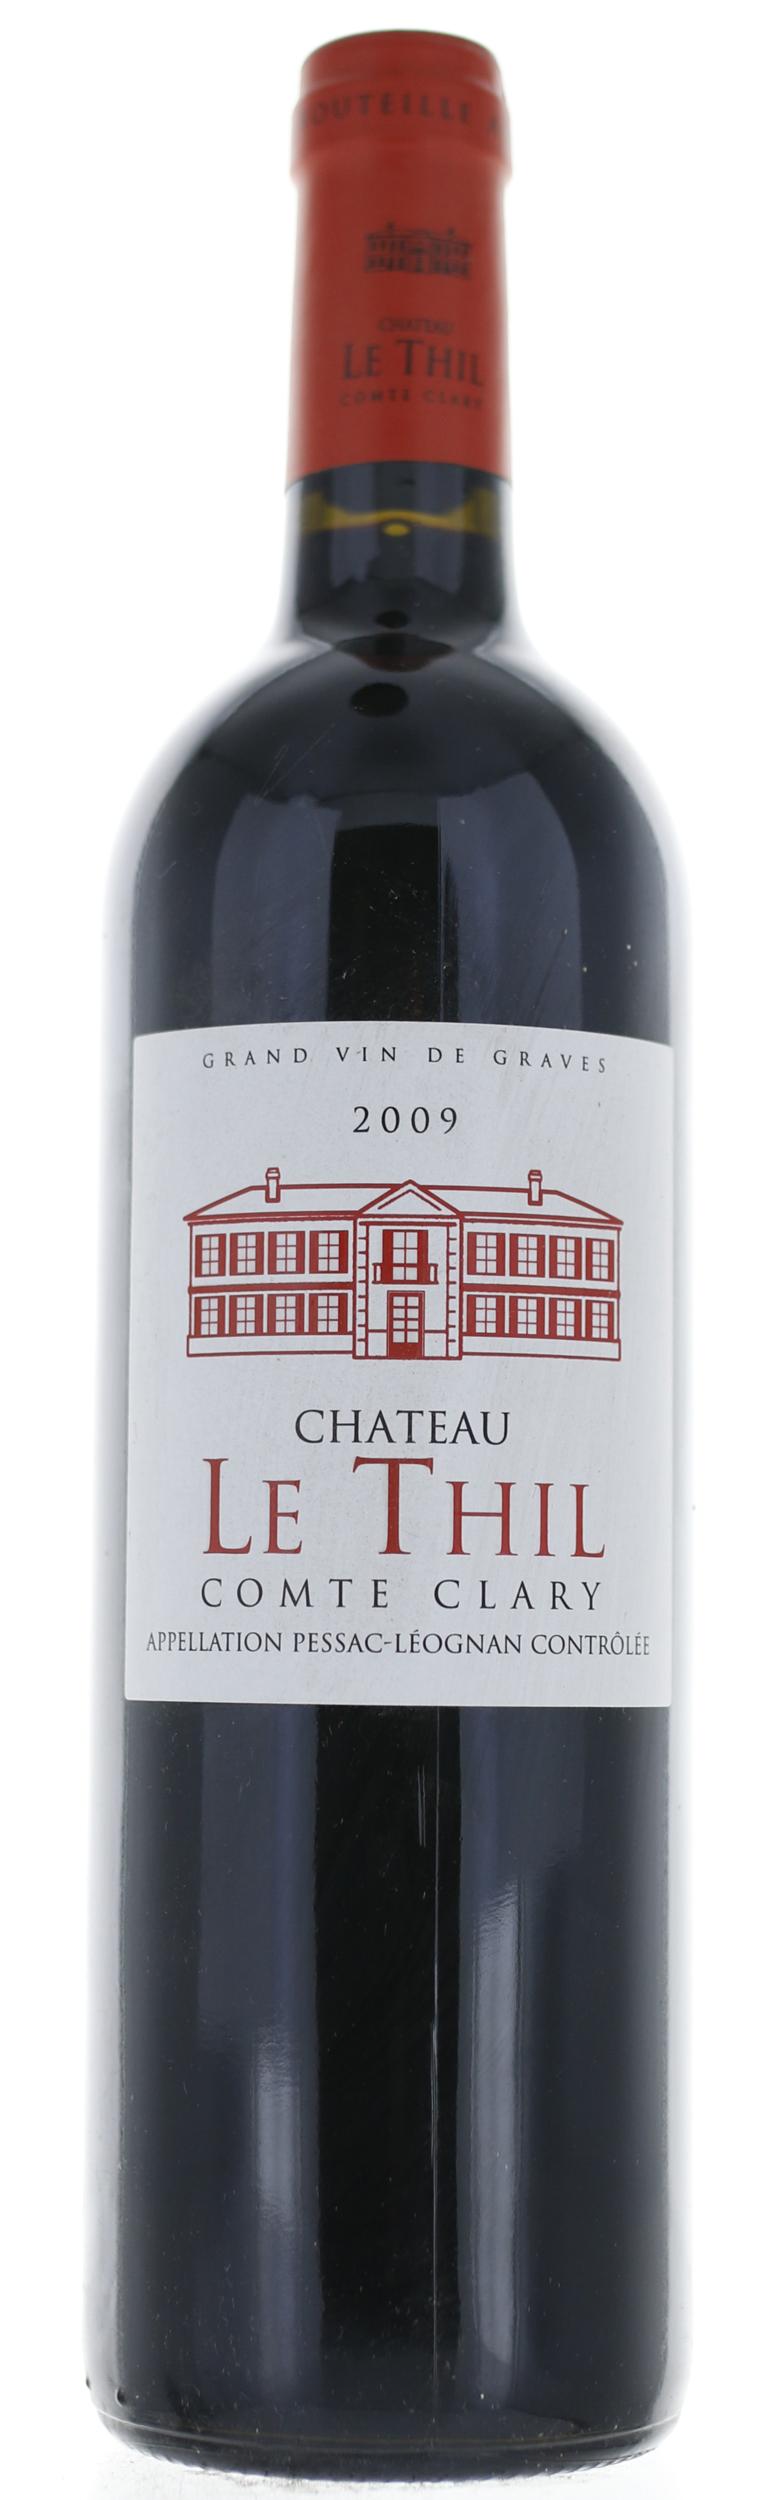 Pessac Leognan - Le Thill Comte Clary - 2009